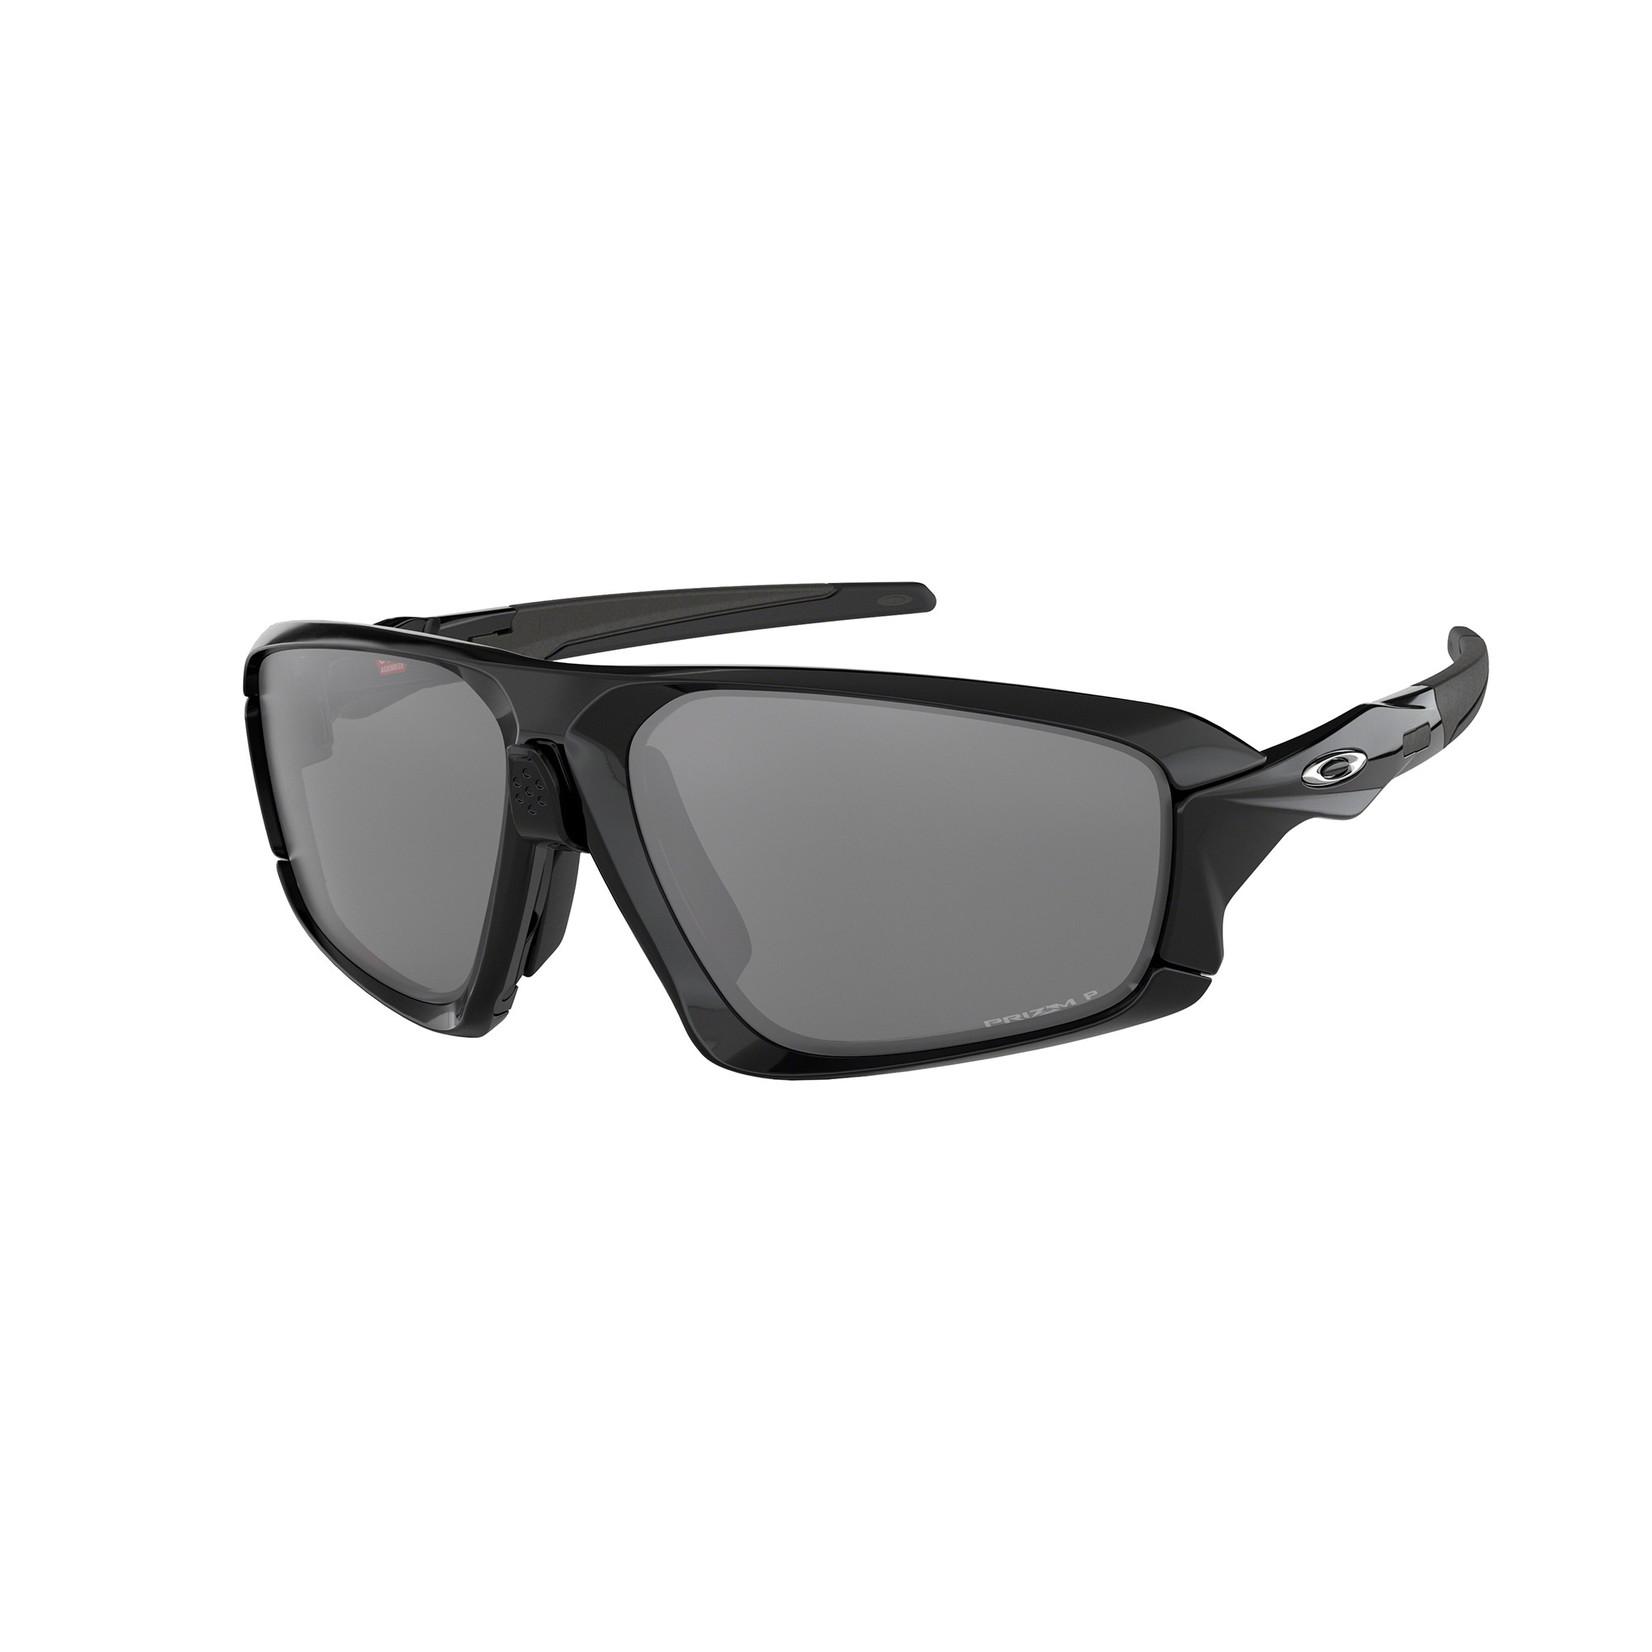 Oakley Field Jacket Sunglasses Black/Prizm Black Polarized